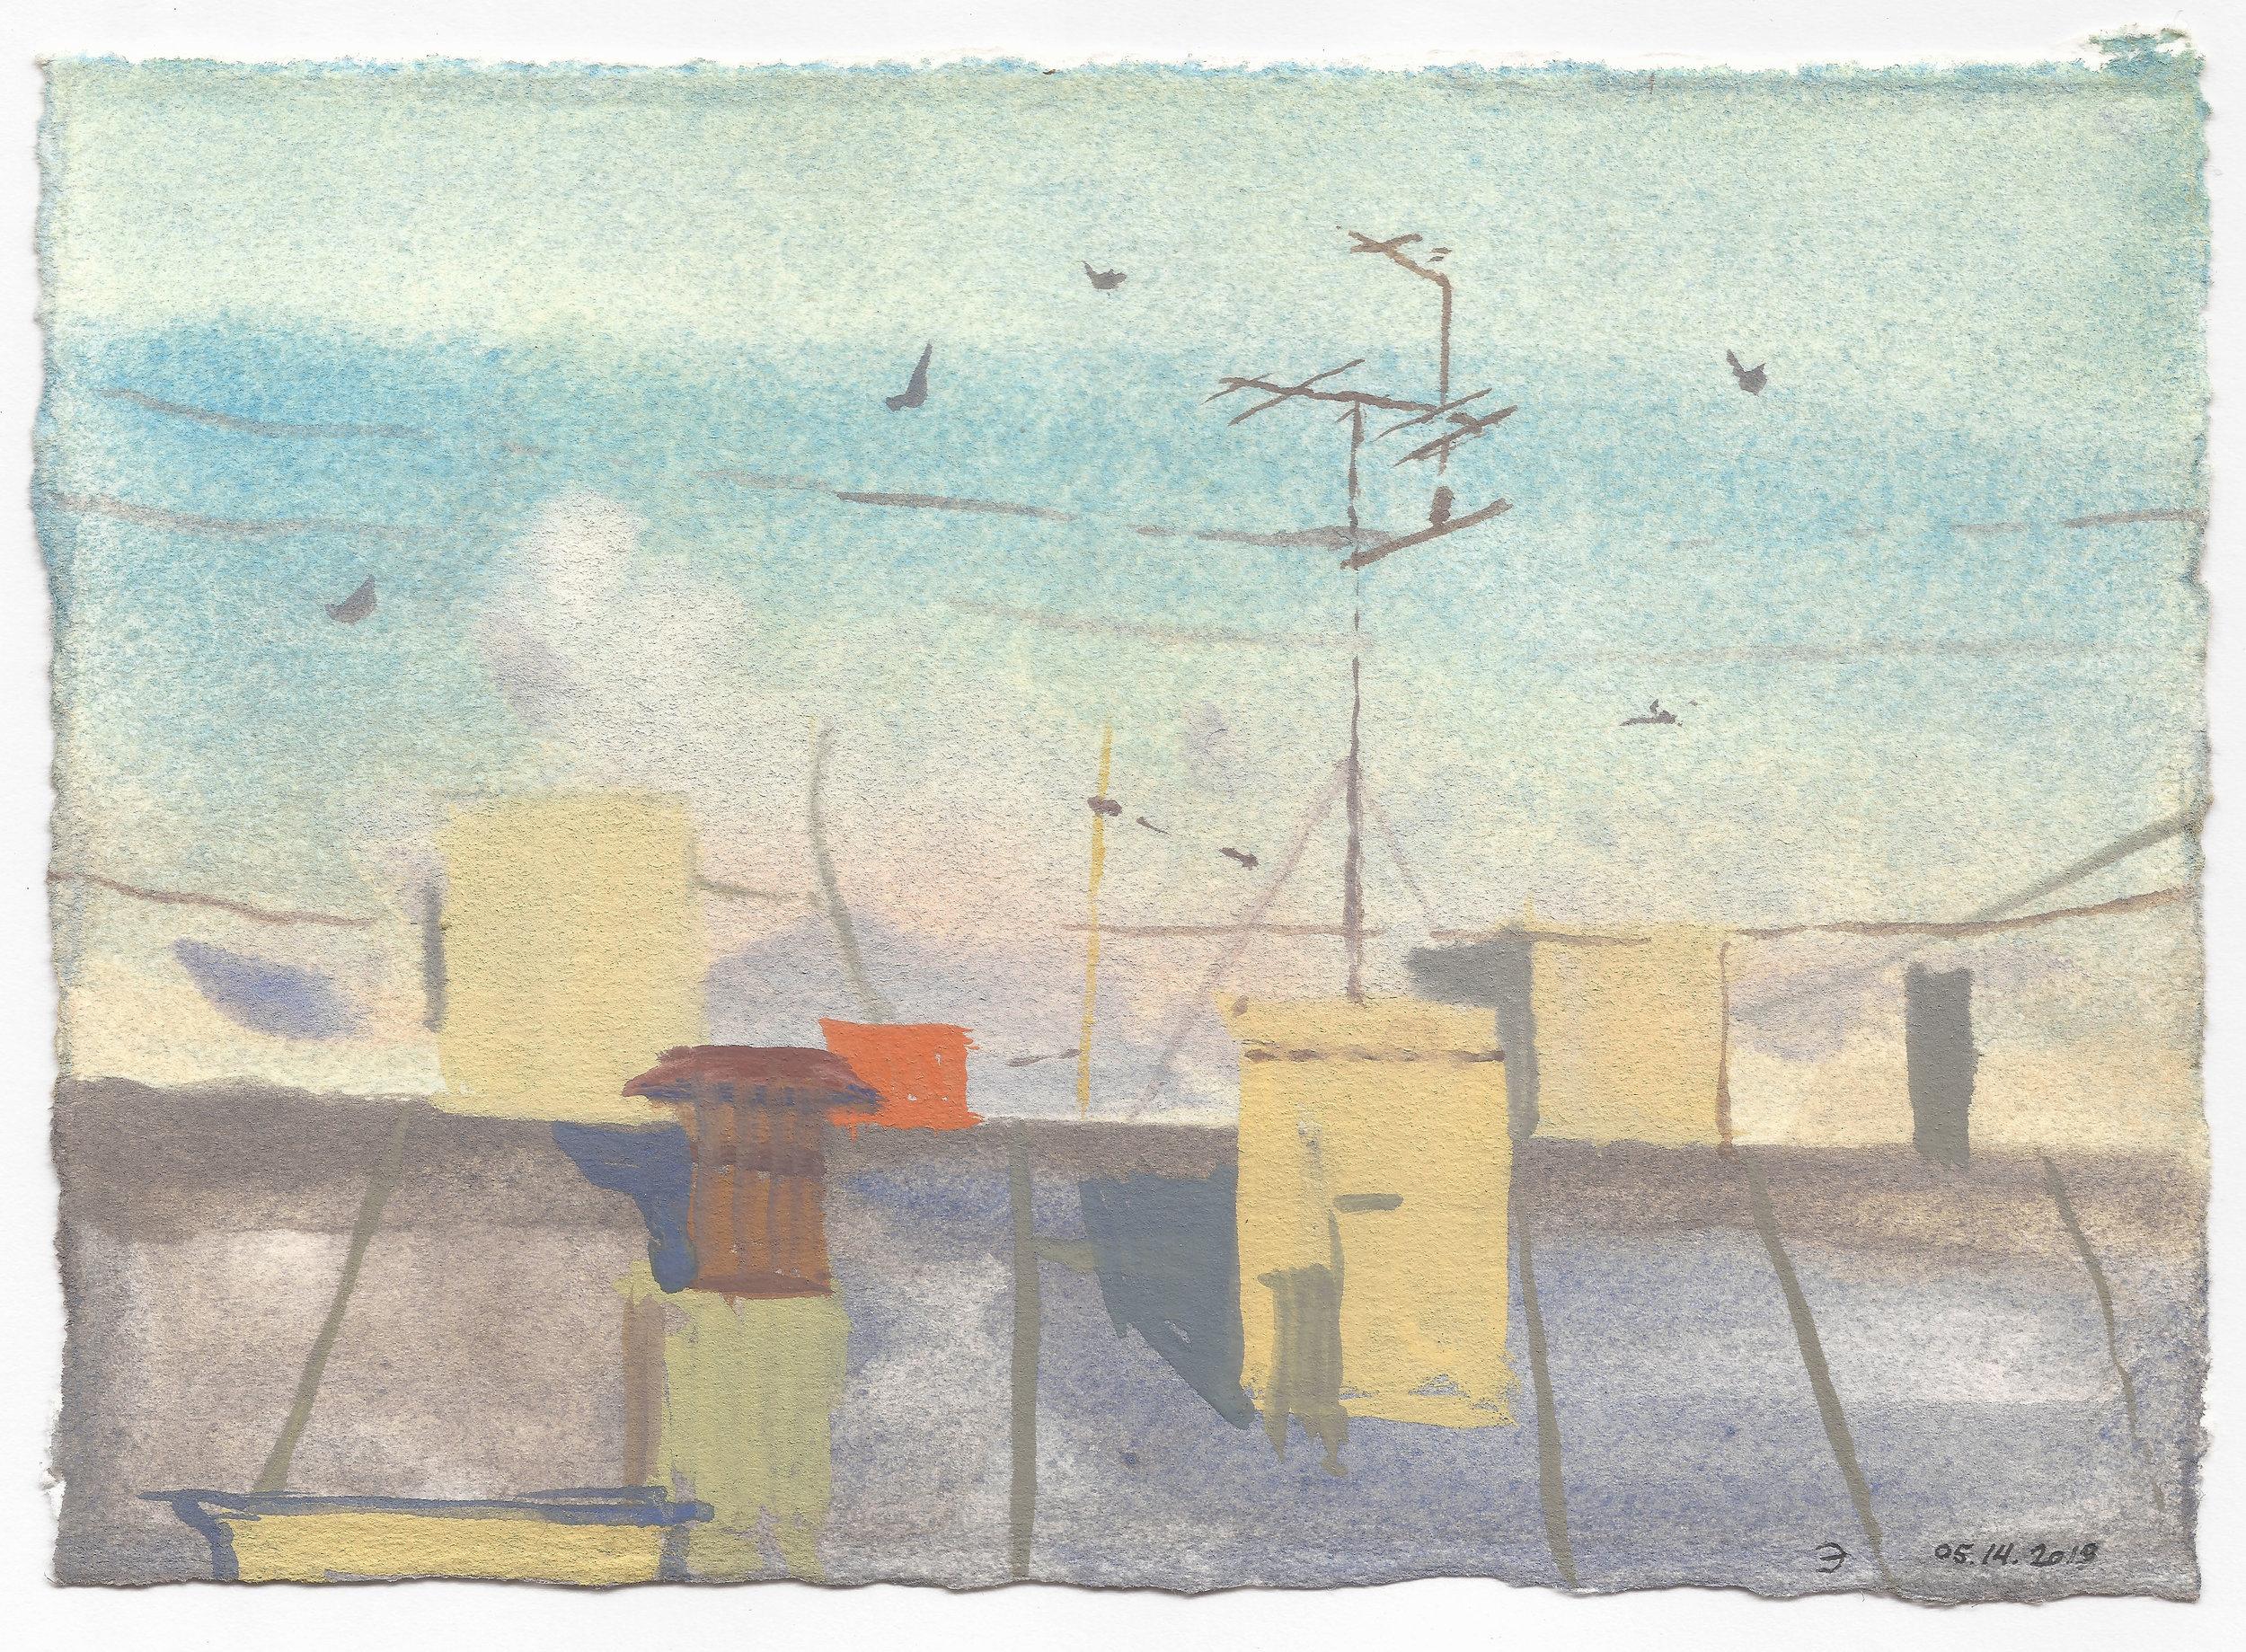 Kharkov's Rooftops